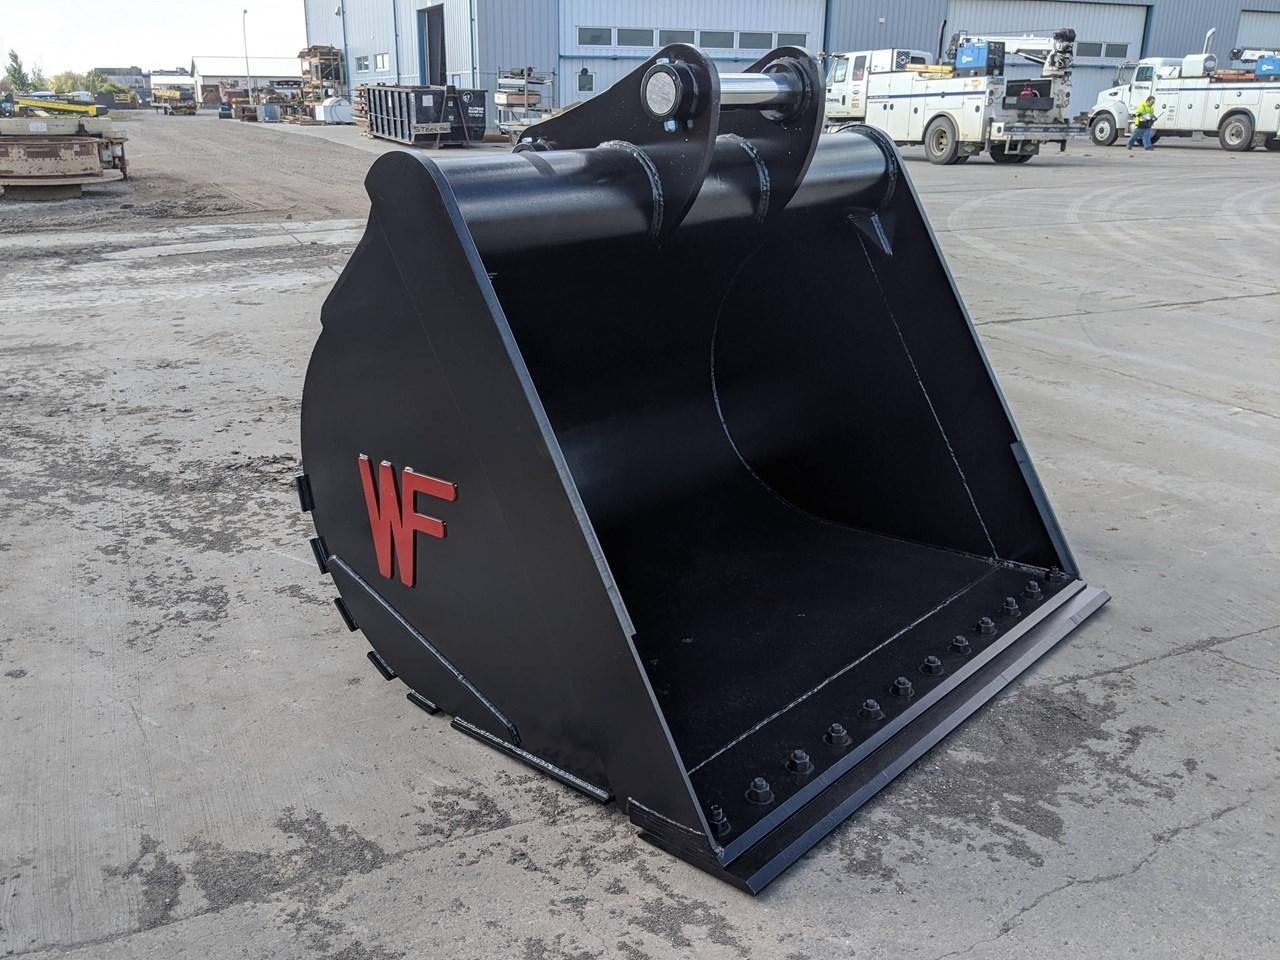 2020 WAHPETON FABRICATION PC360D72 Excavator Bucket For Sale